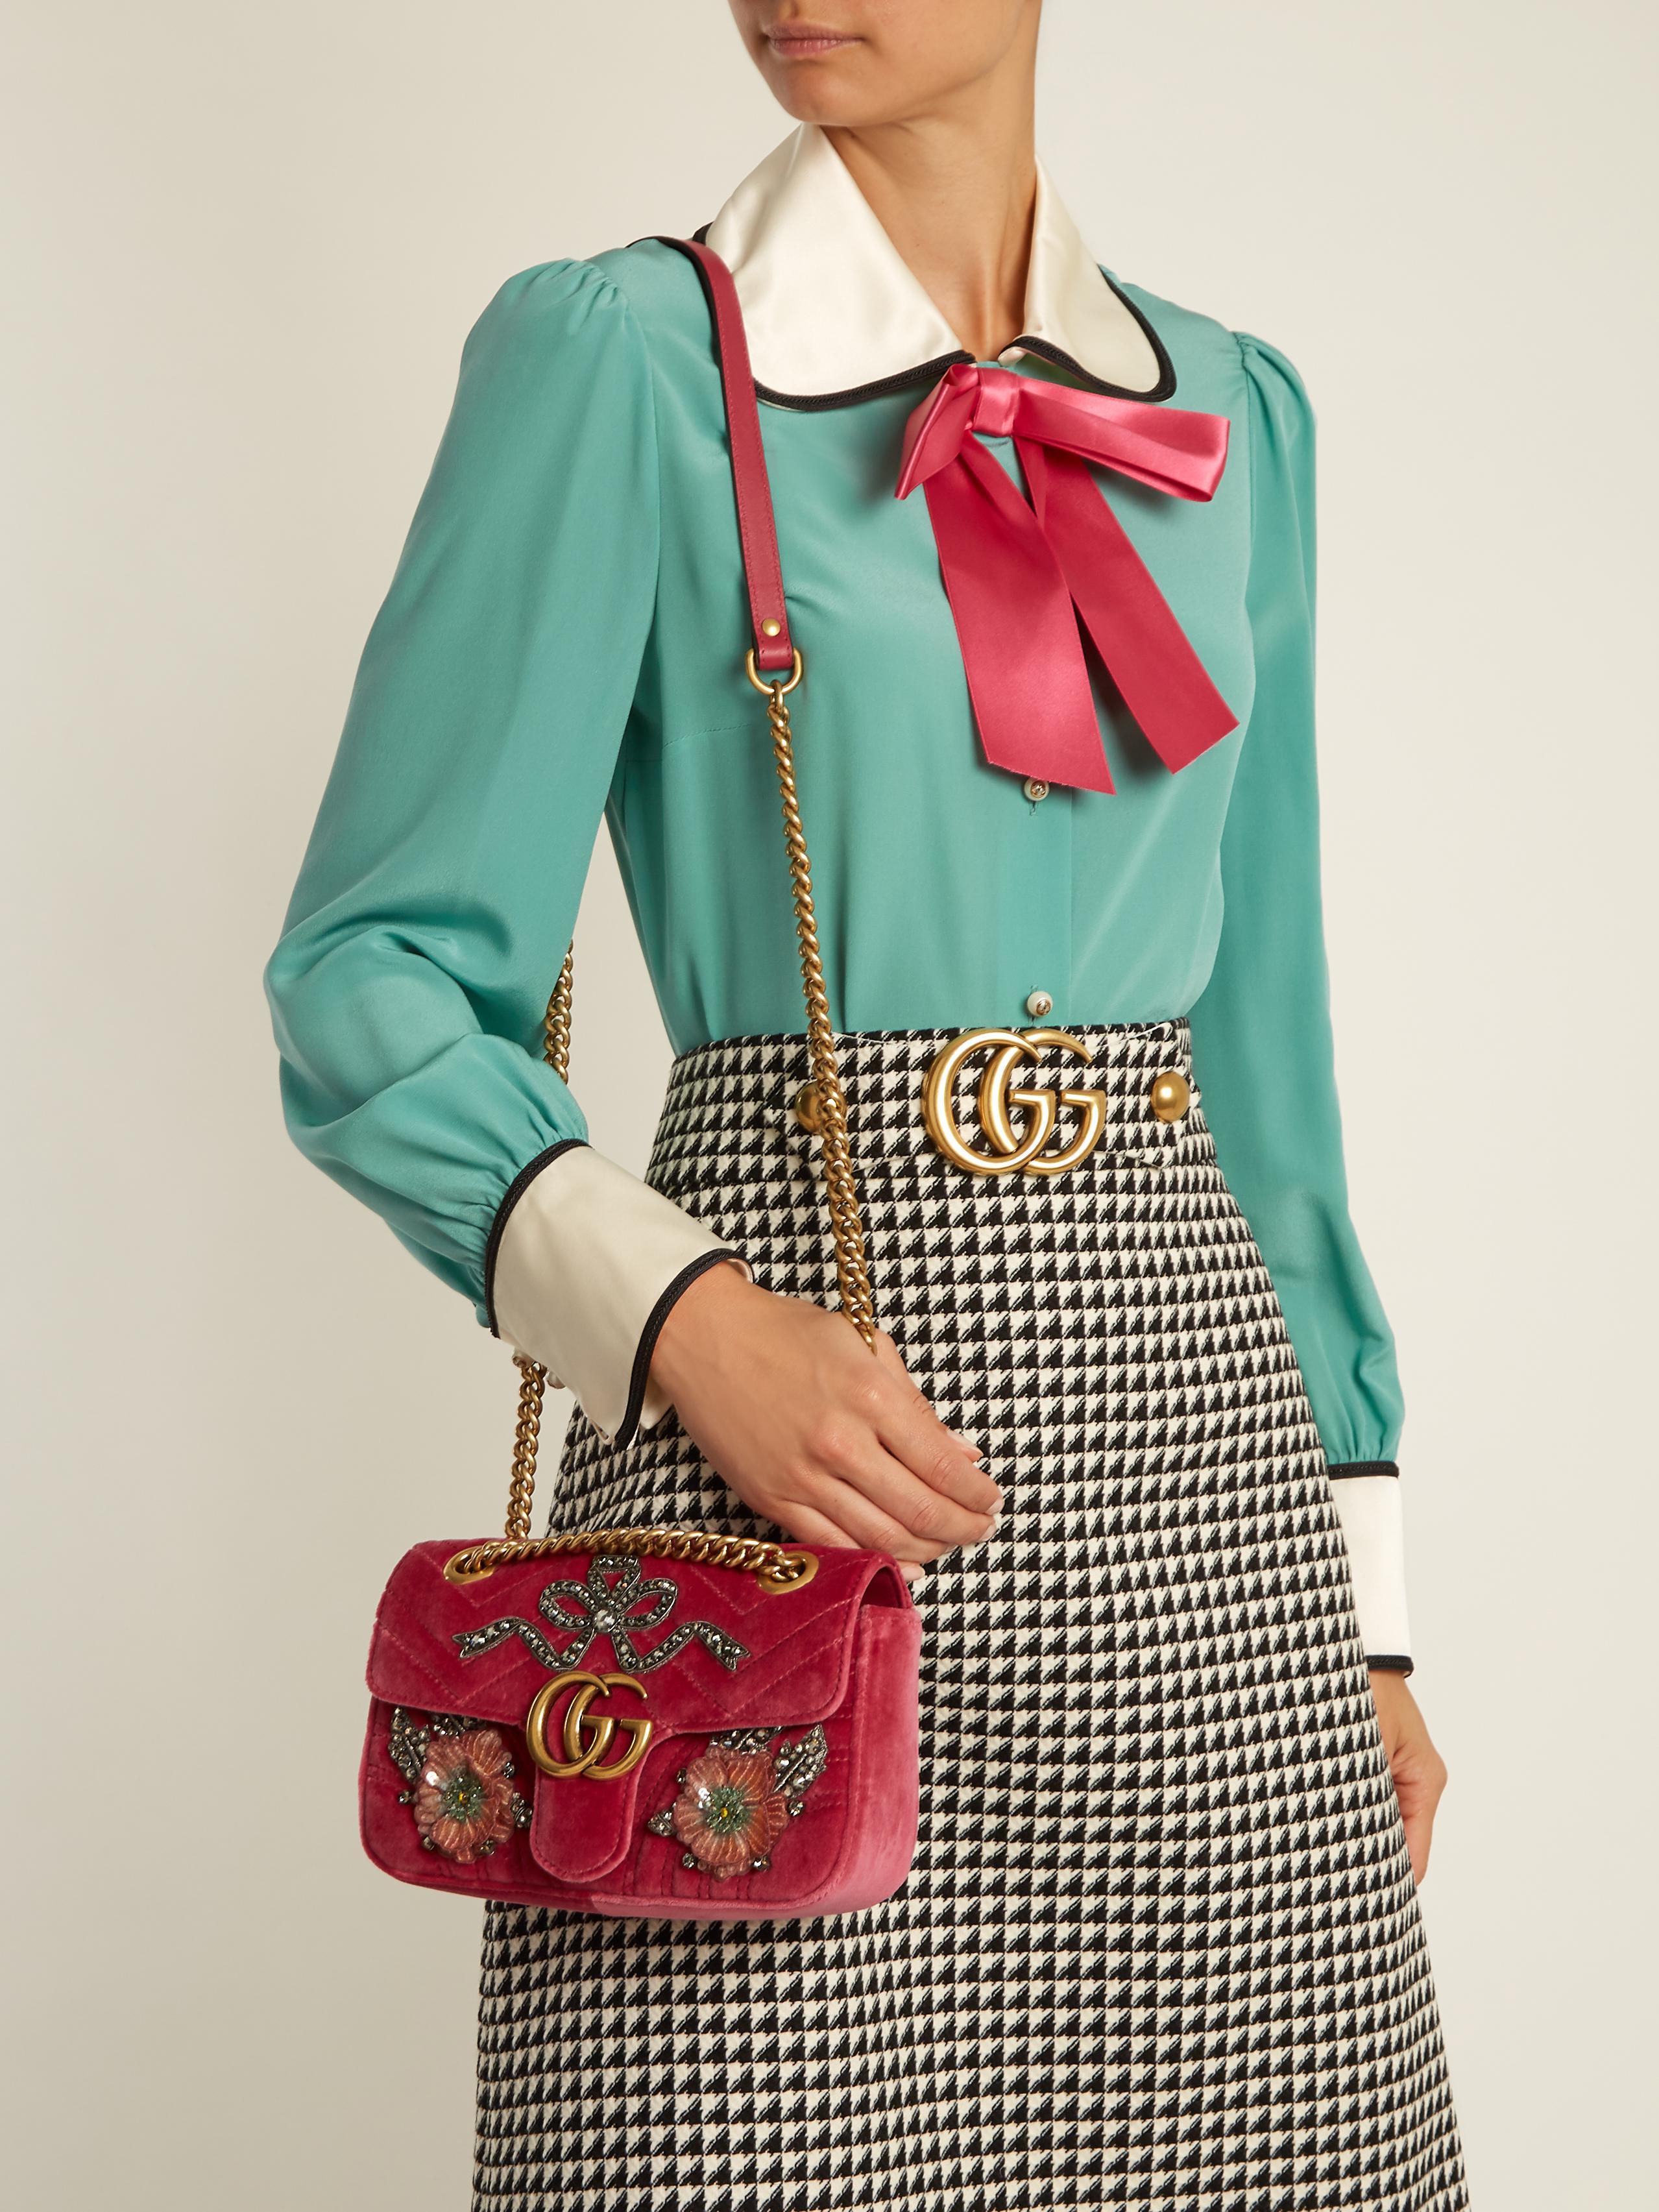 Pink Mini Velvet Marmont 2.0 Bag Gucci dM4pJp